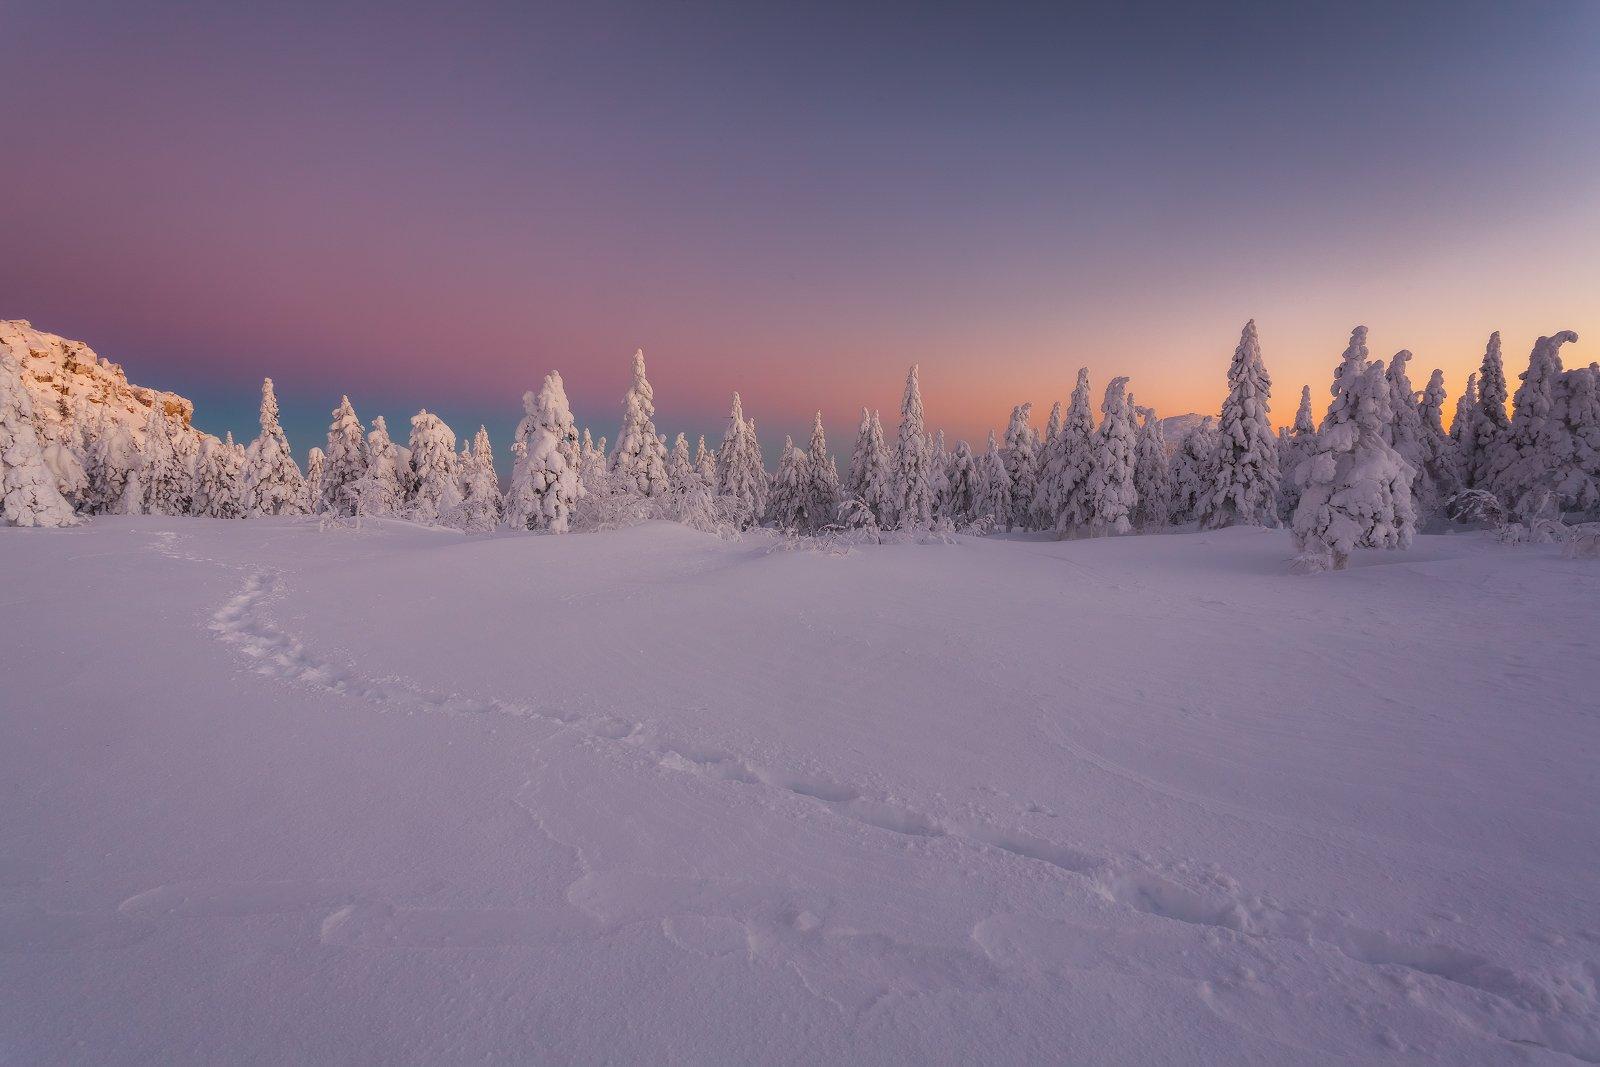 зима, урал, таганай, златоуст, рассвет, t_berg, Михаил Трахтенберг ( t_berg )